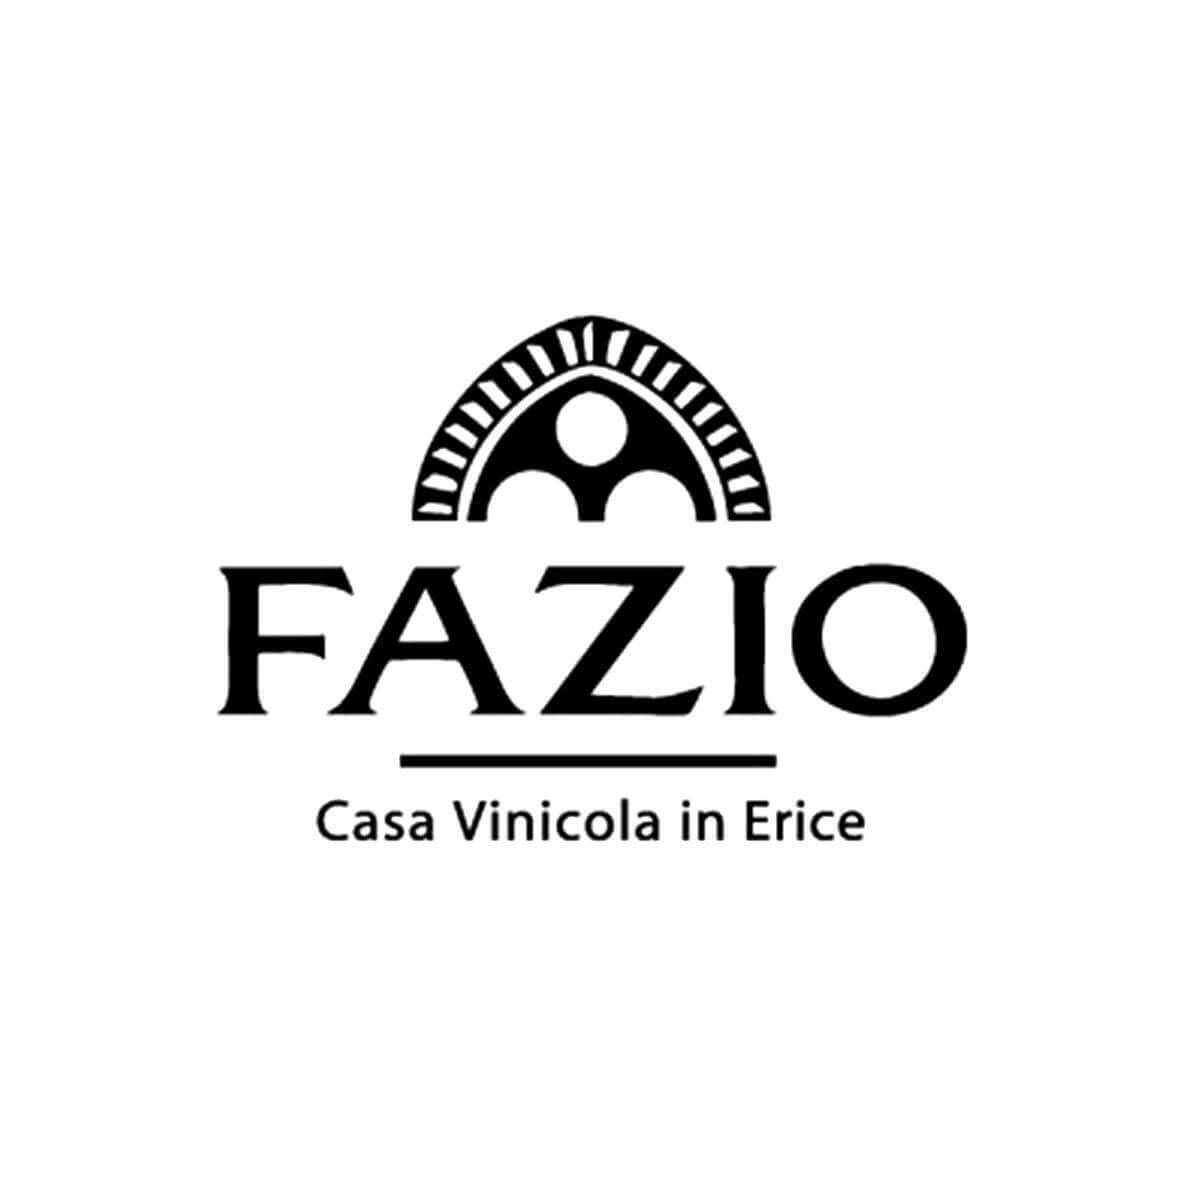 Casa Vinicola Fazio